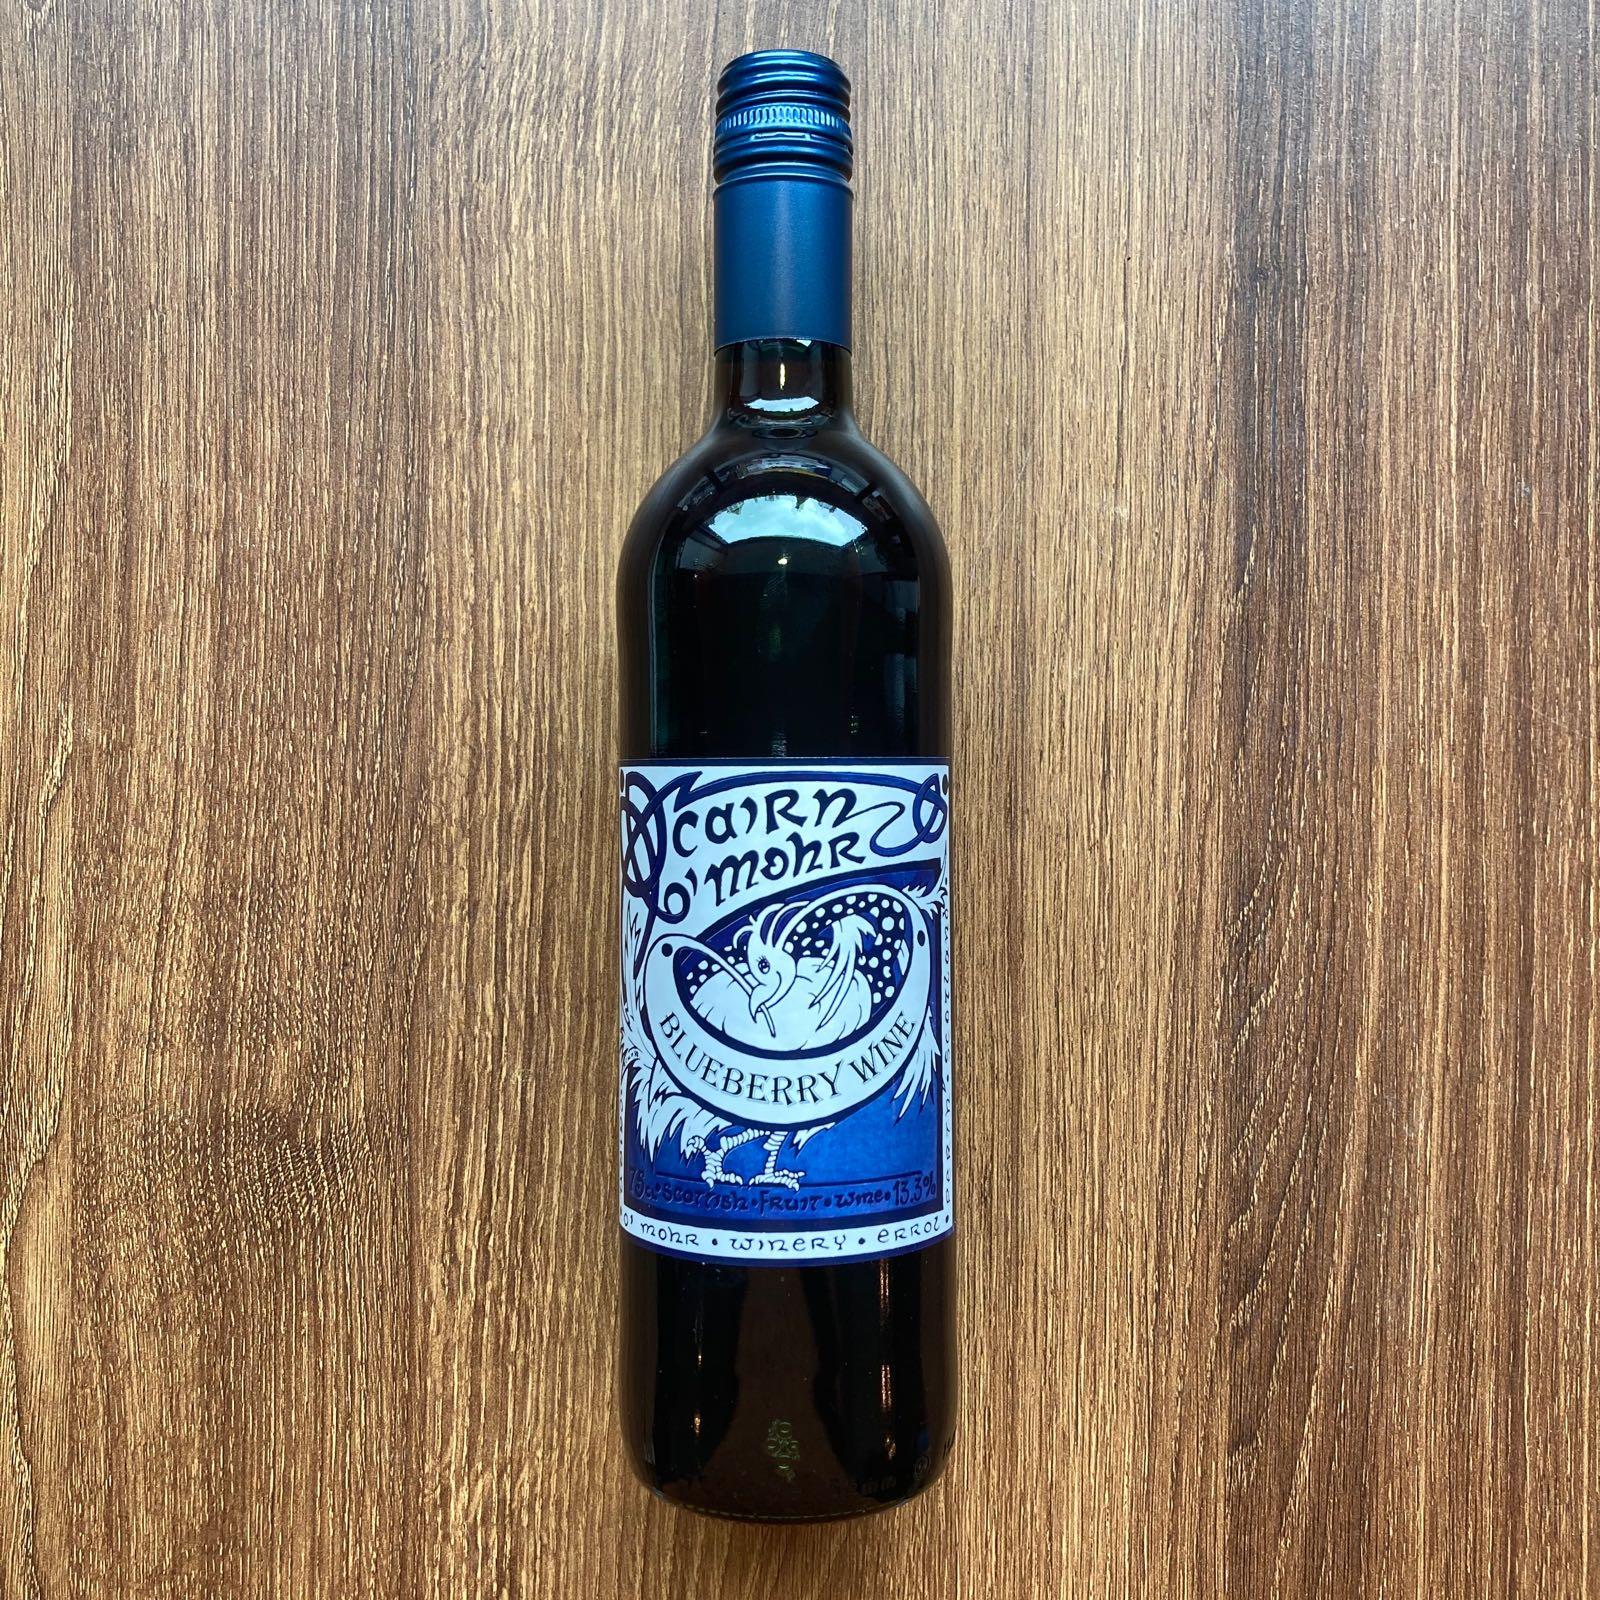 Blueberry Wine - Cairn O' Mohr